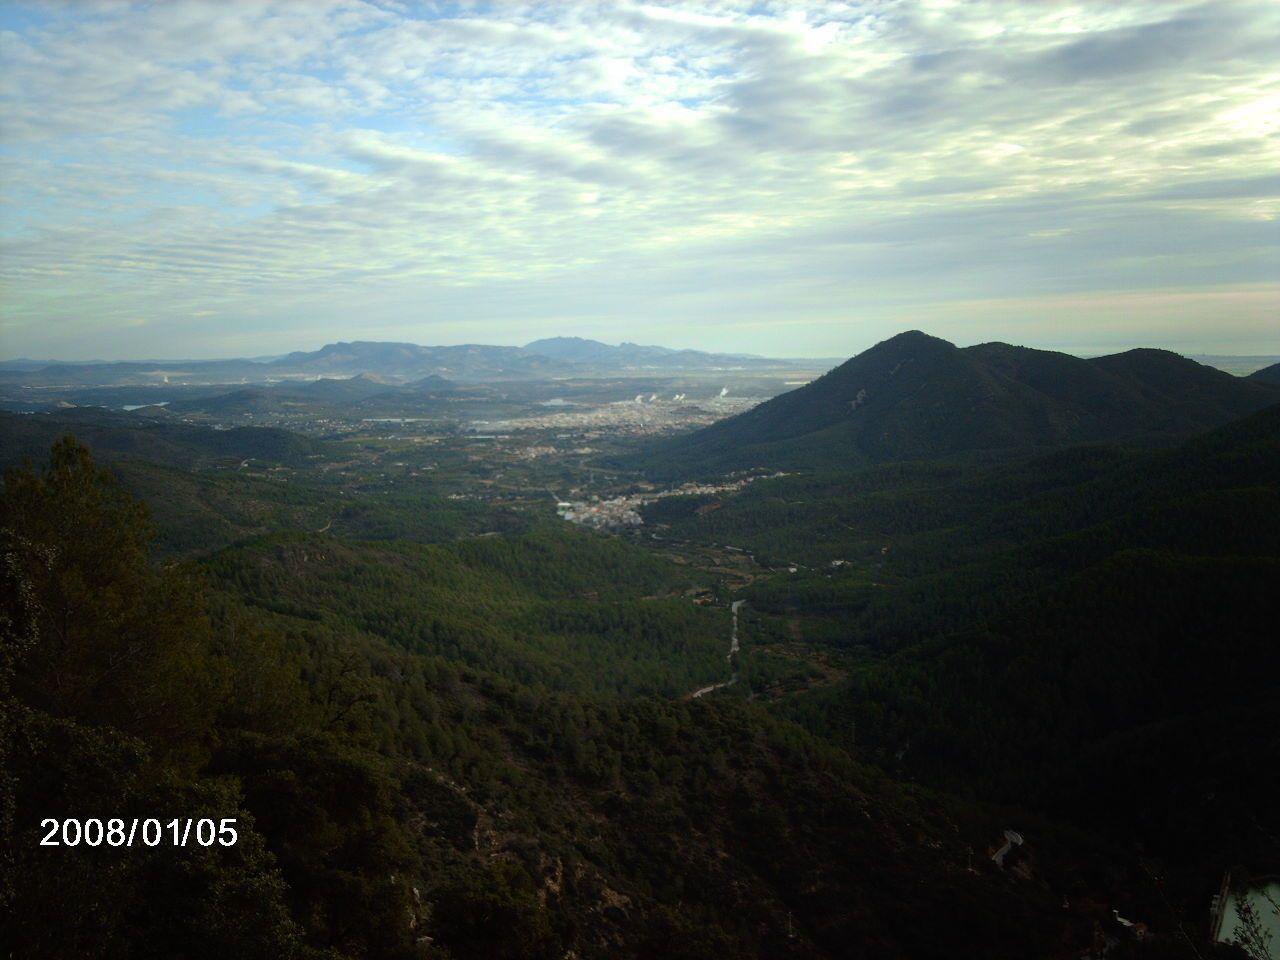 IMAG2911